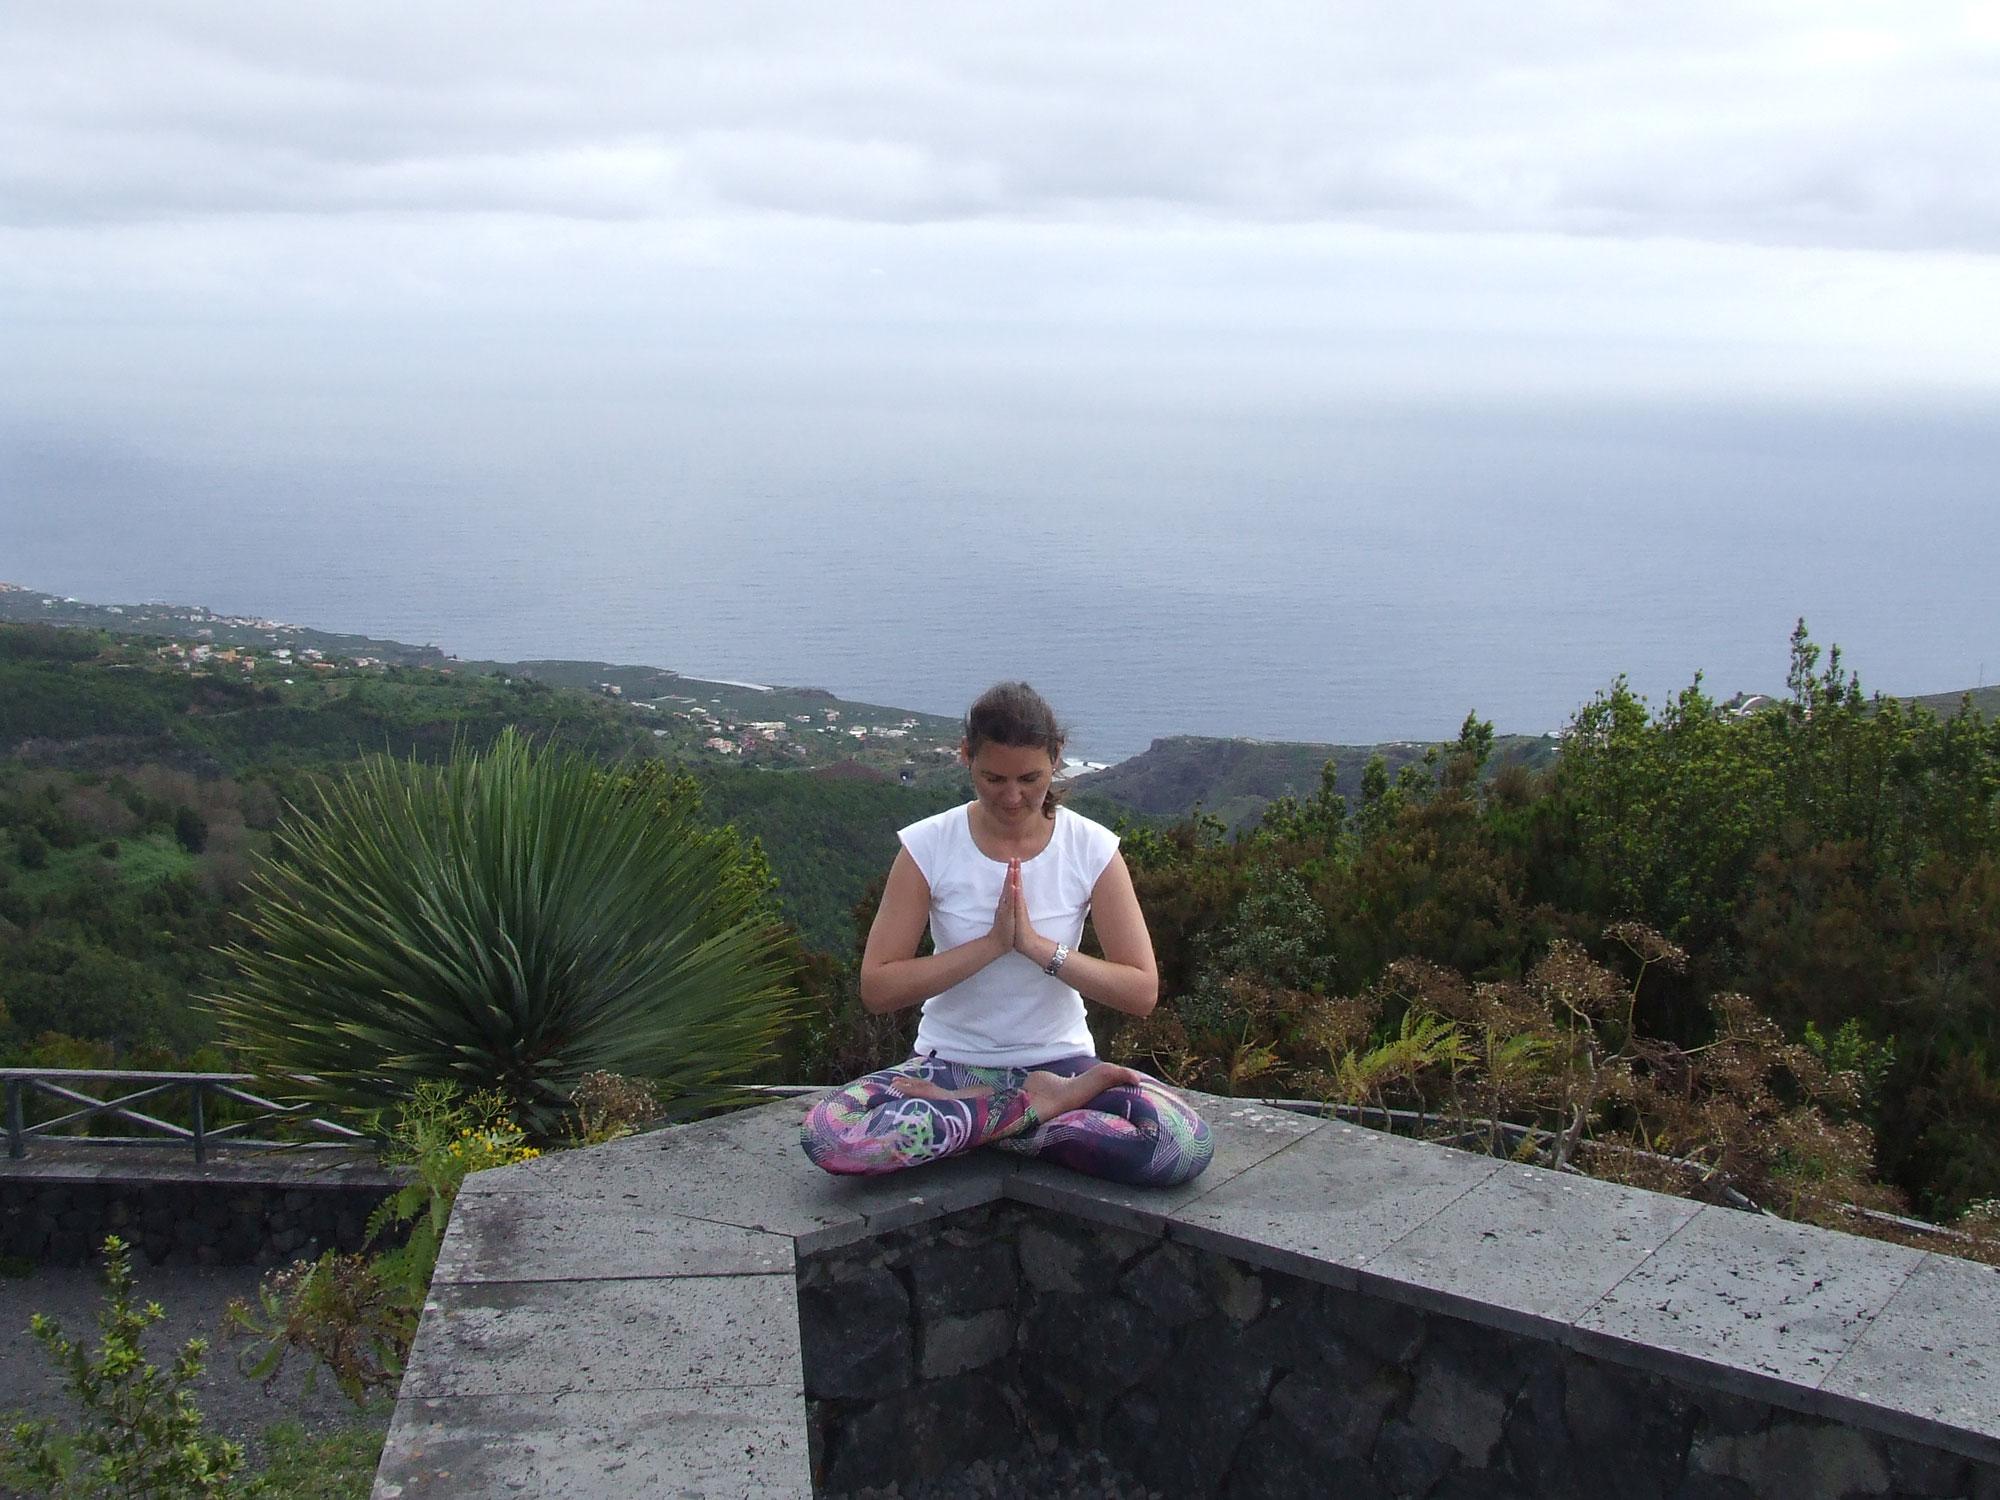 Folge #19 - Meditation leicht gemacht